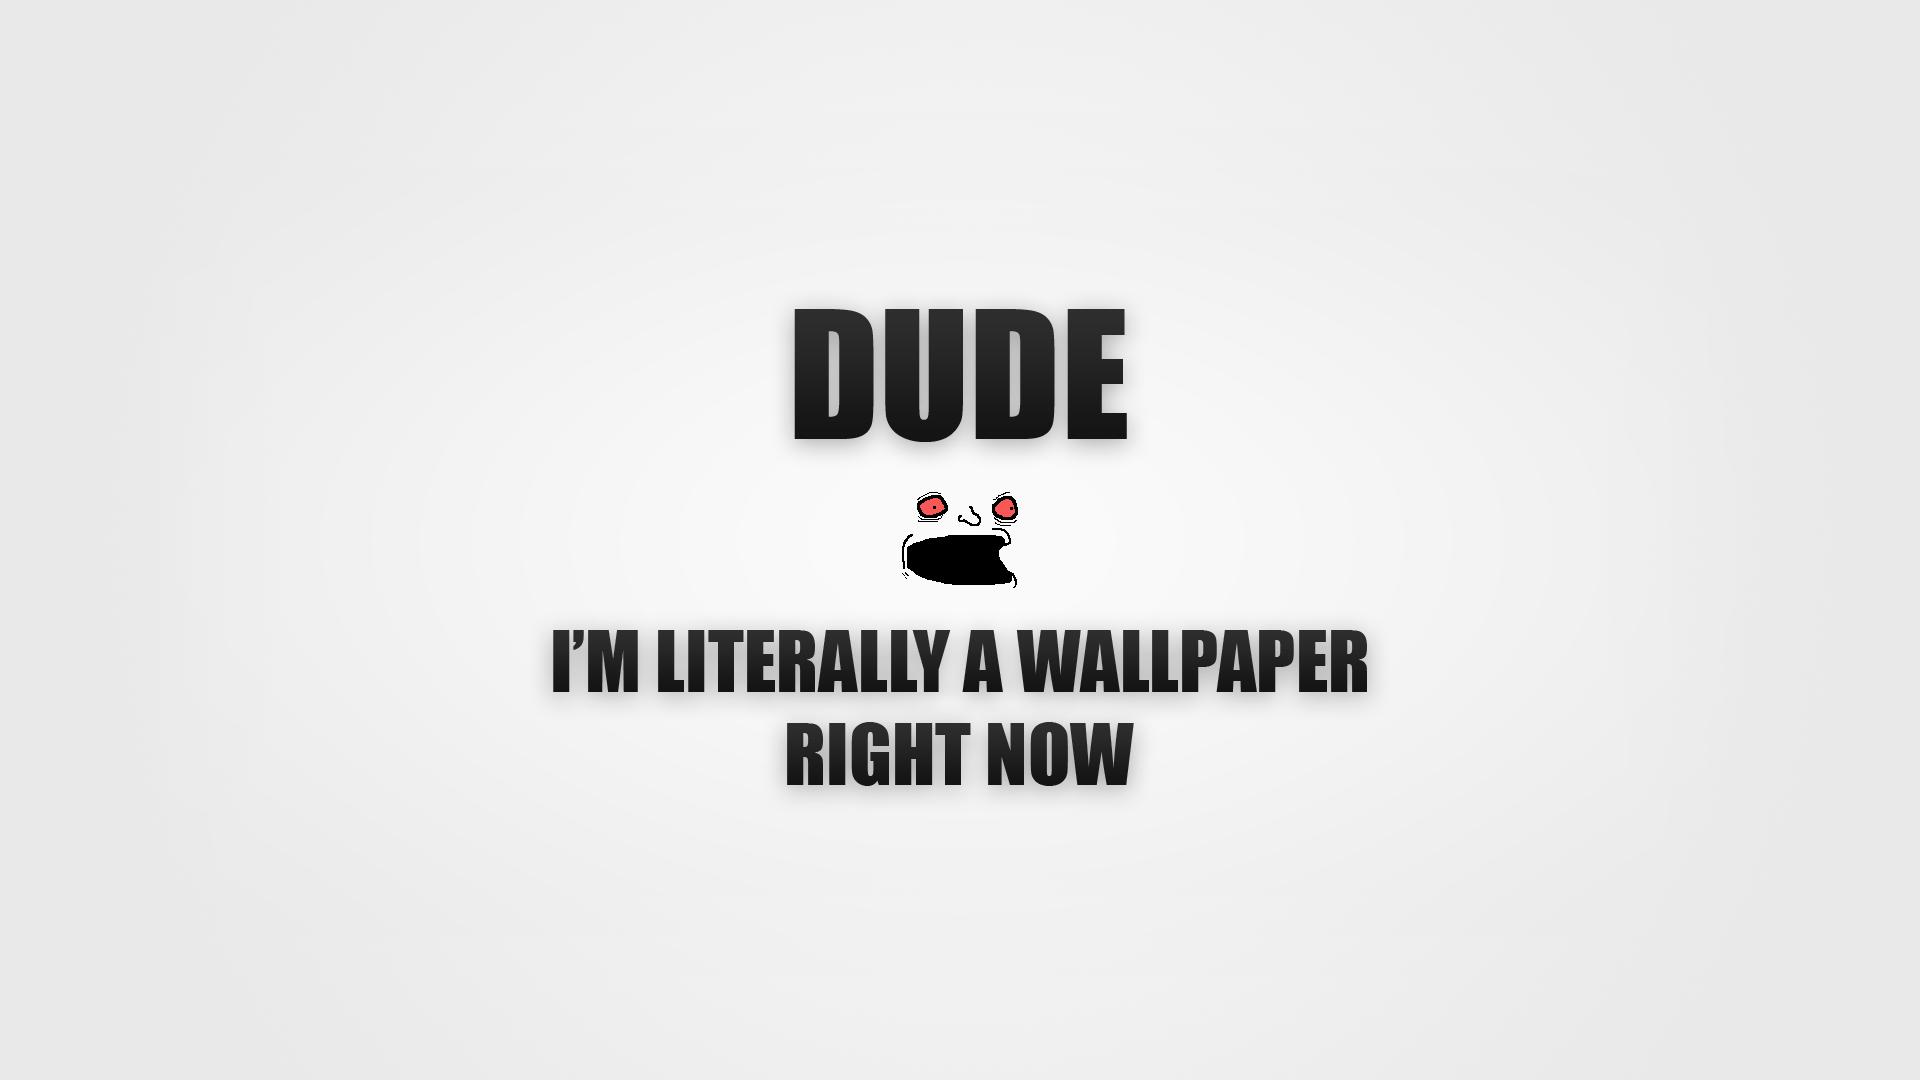 Wallpaper Quotes For Desktop Background